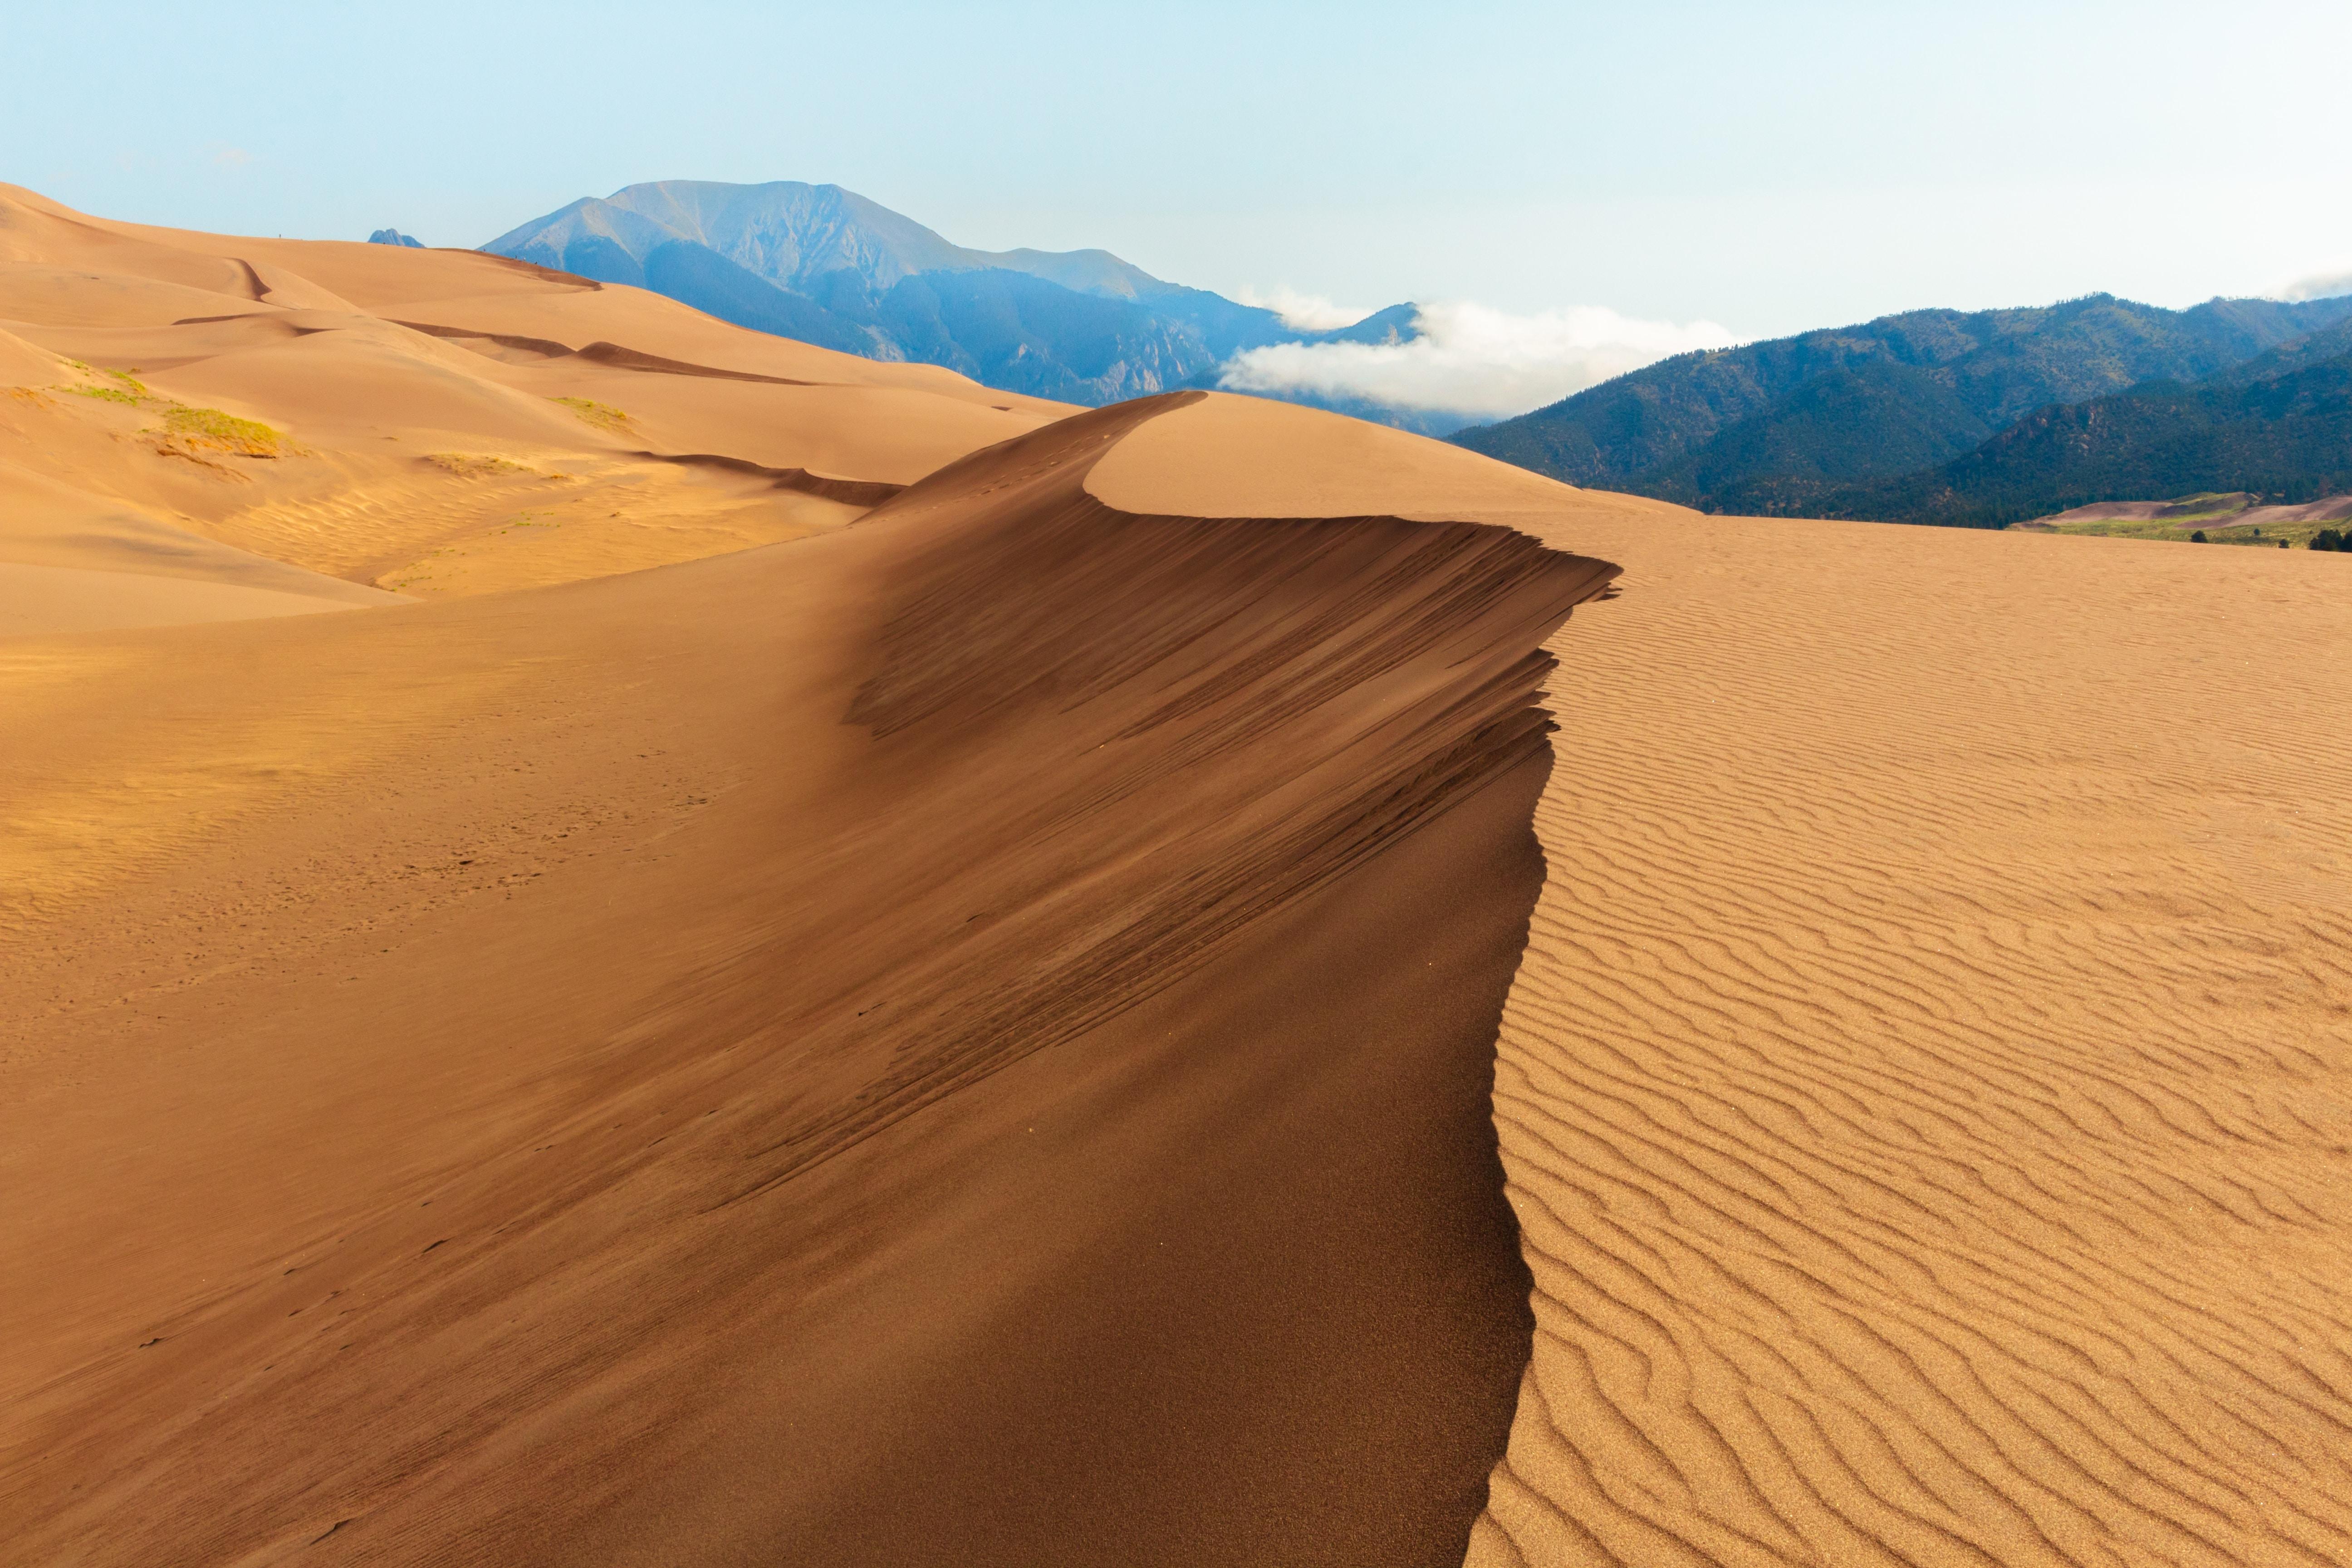 desert near mountain